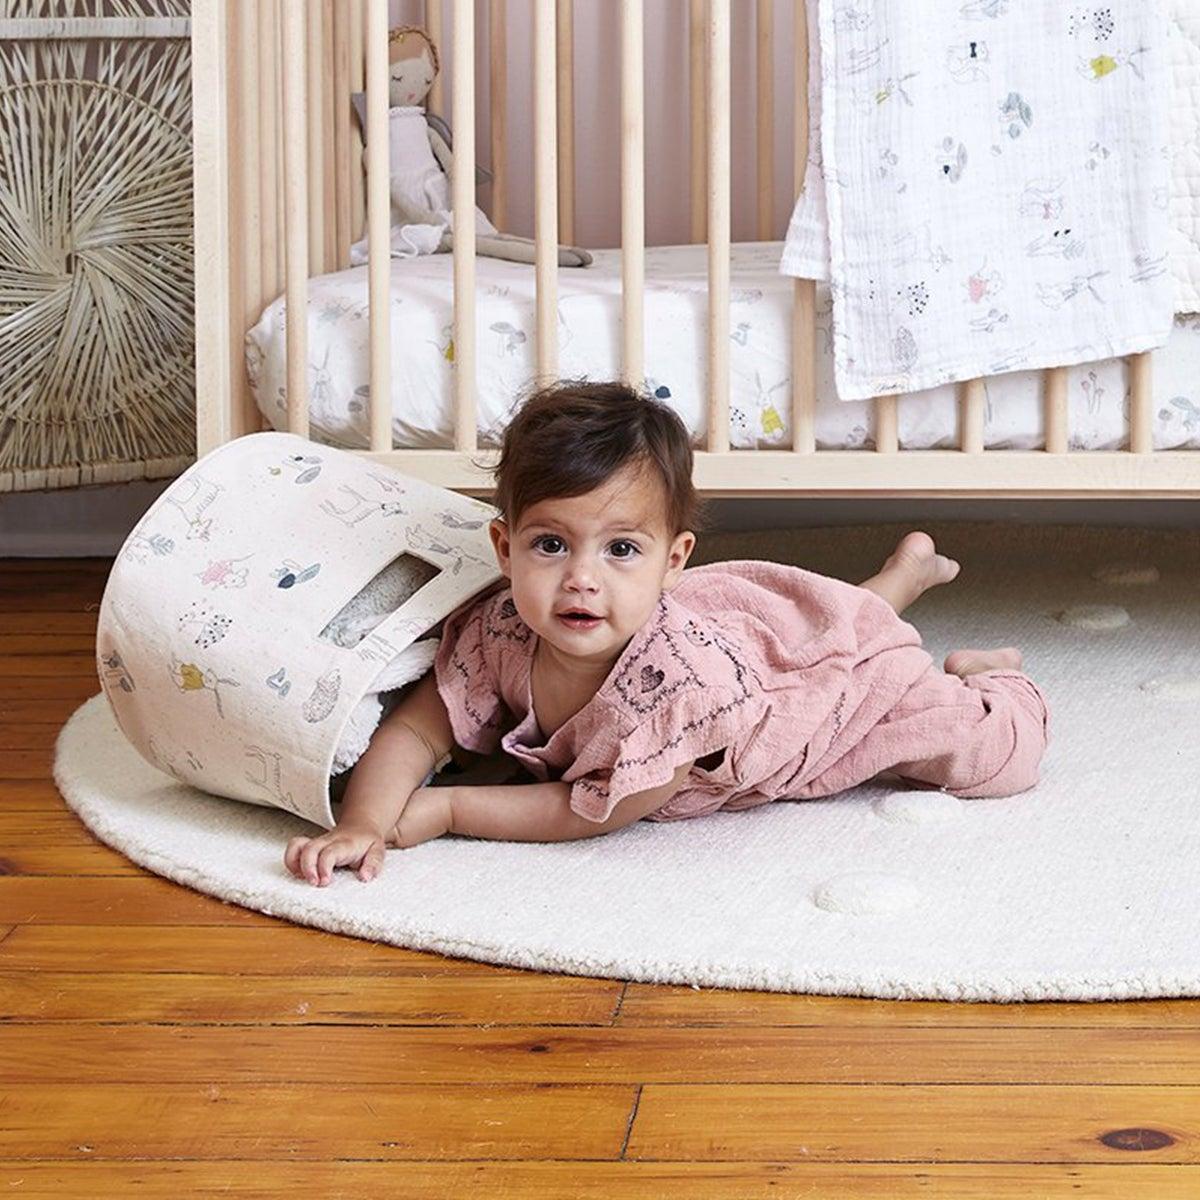 A baby crawling next to a crib